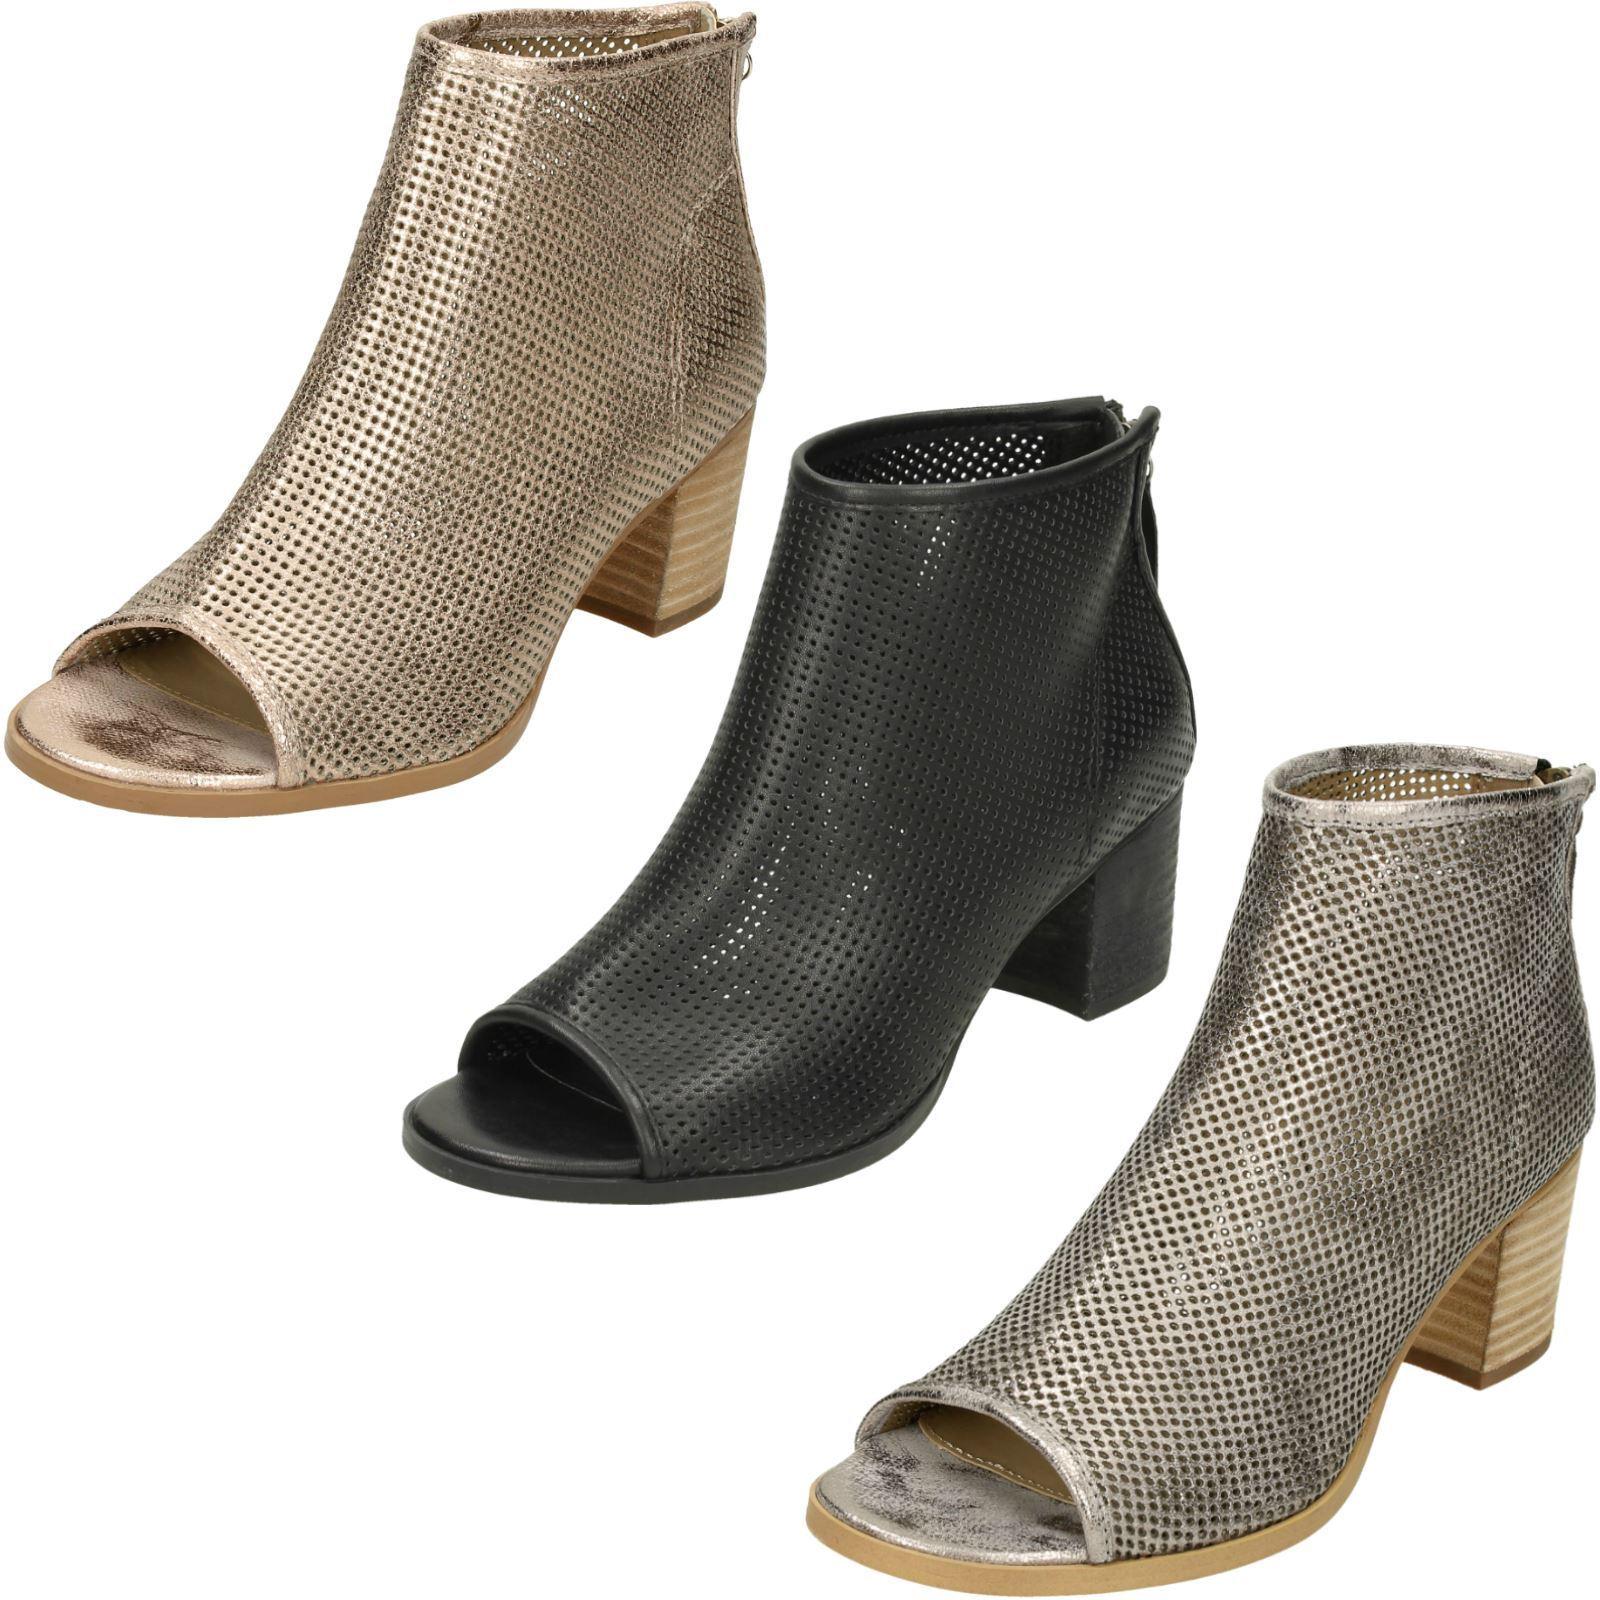 mesdames savannah les les savannah escarpins bottes d64c11